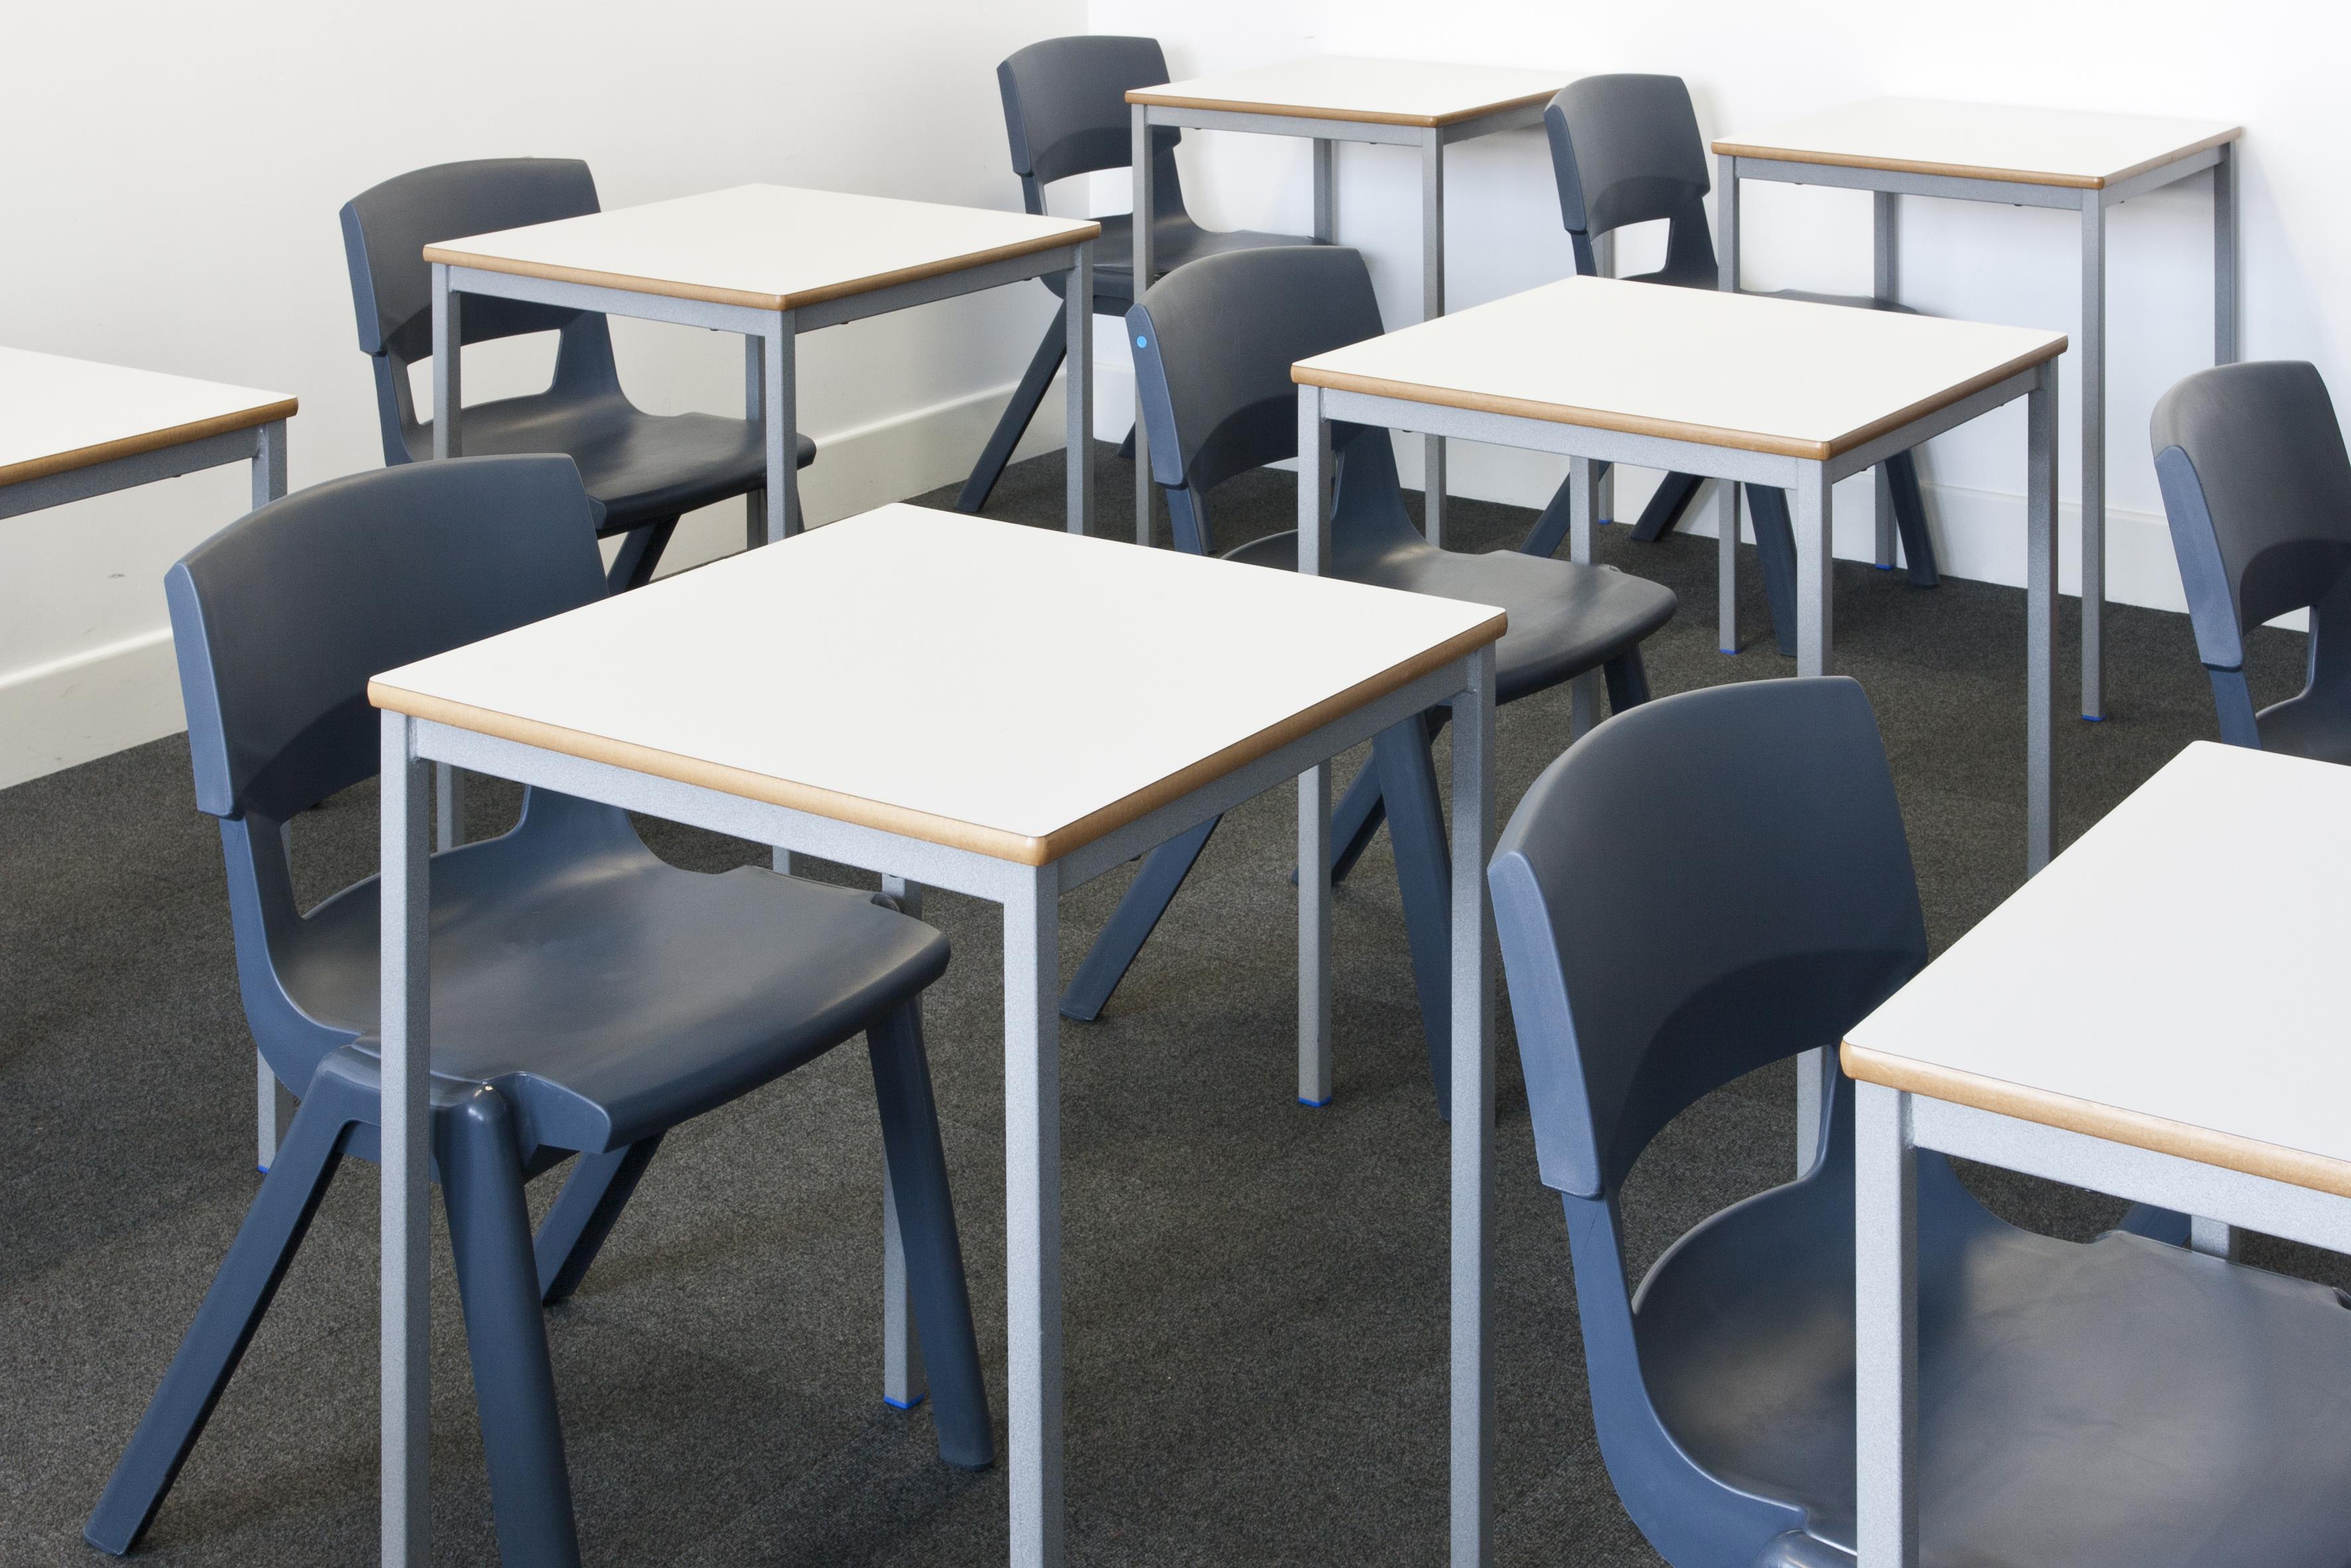 Dark-Blue-Postura-Plus-Chairs-In-Classroom-Set-Up